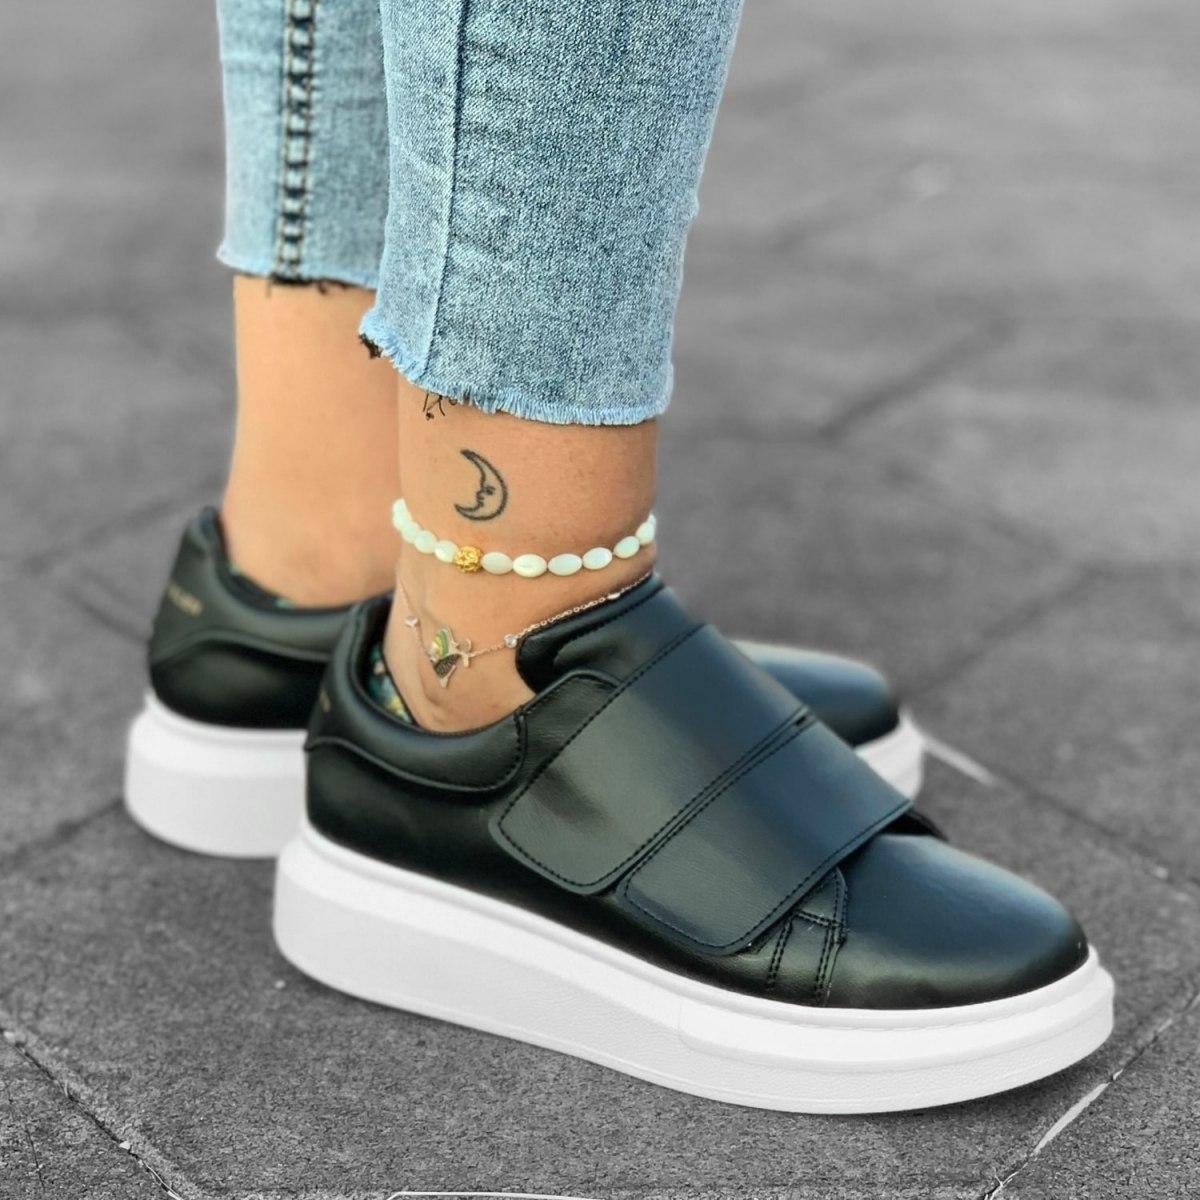 Martin Valen Women's Double Velcro Sneakers Black